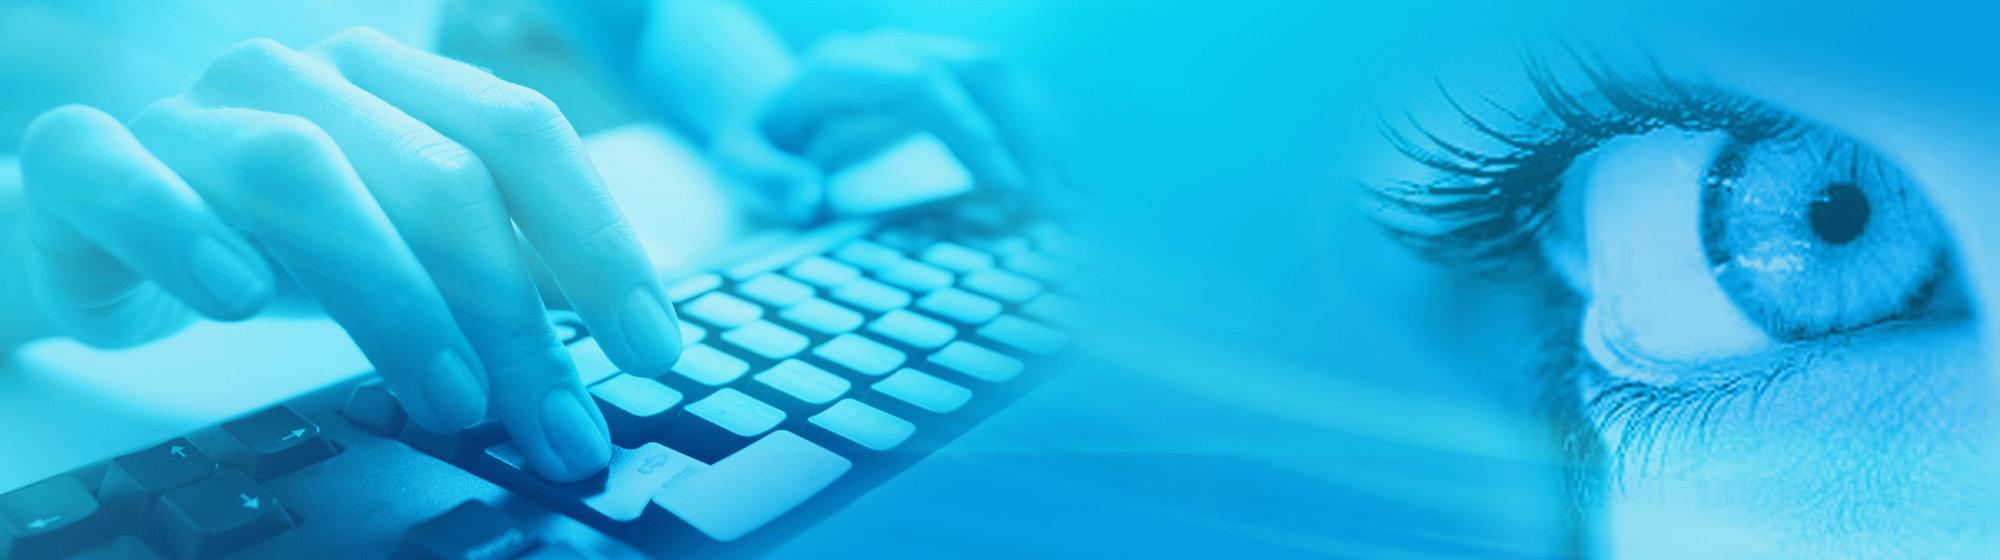 Discover our software catalogue